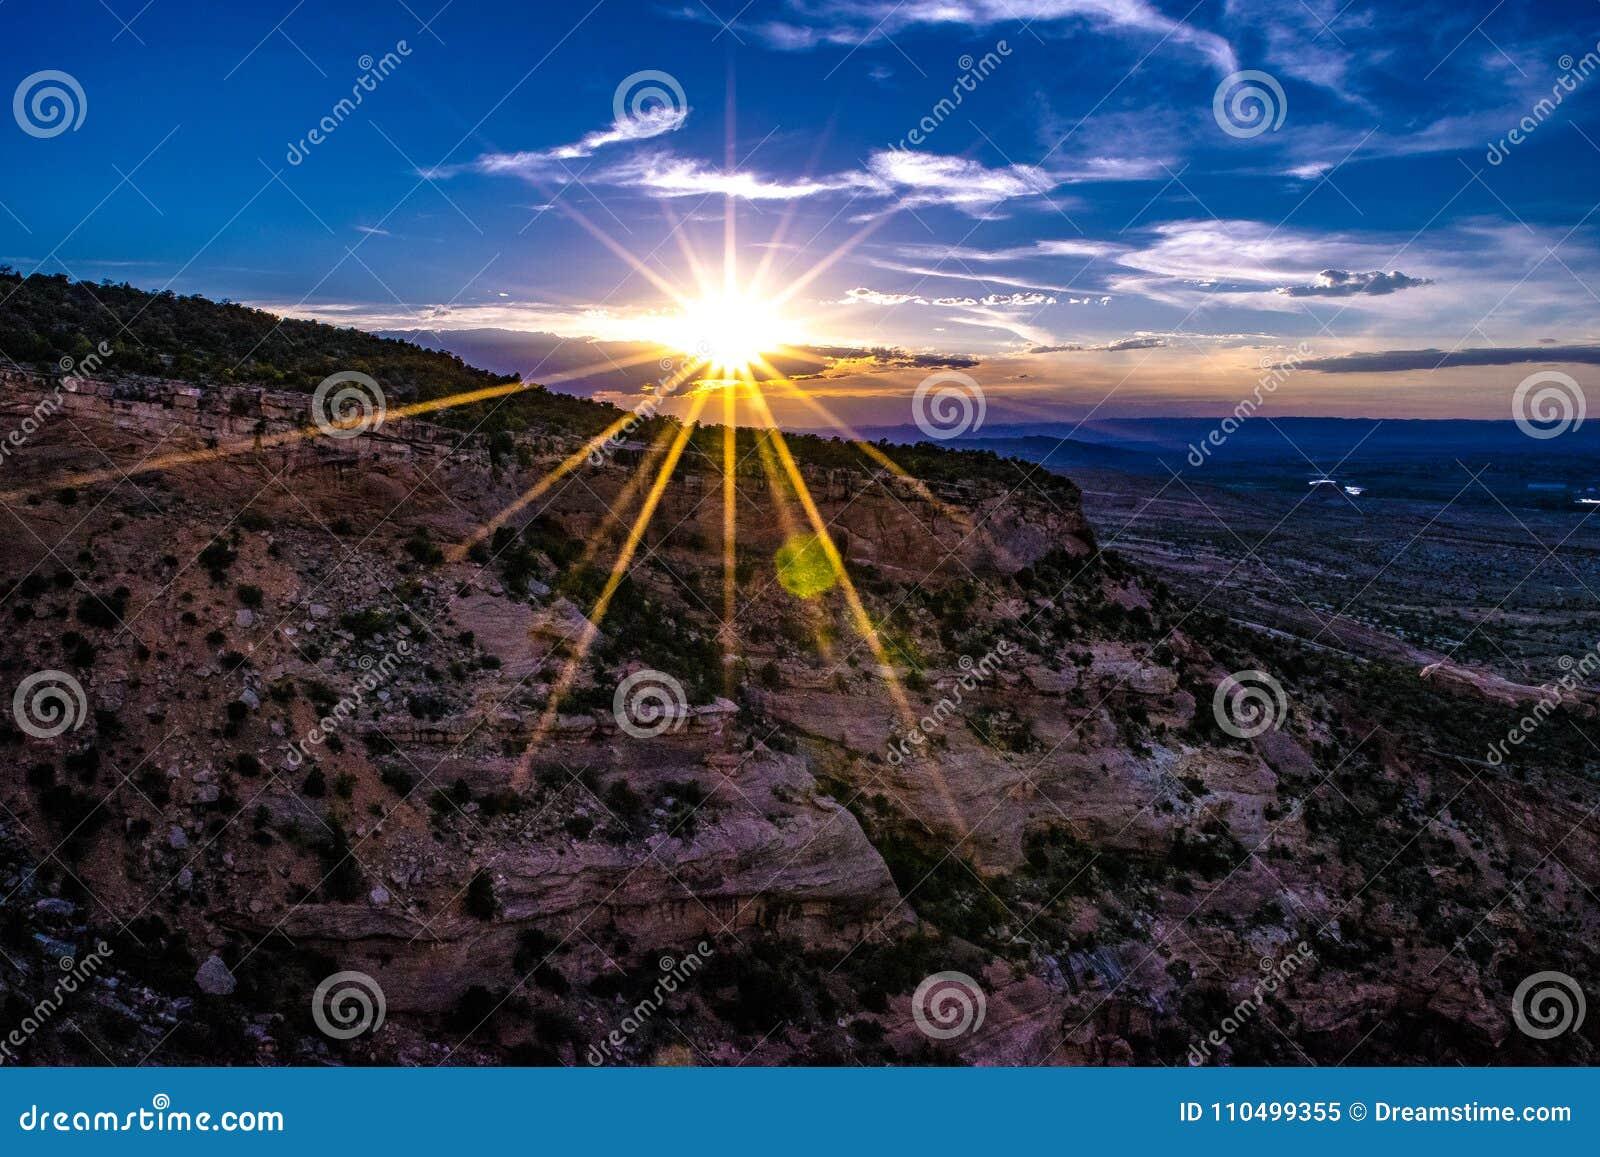 Заход солнца через ущелье каньона на памятниках в Grand Junction, Колорадо